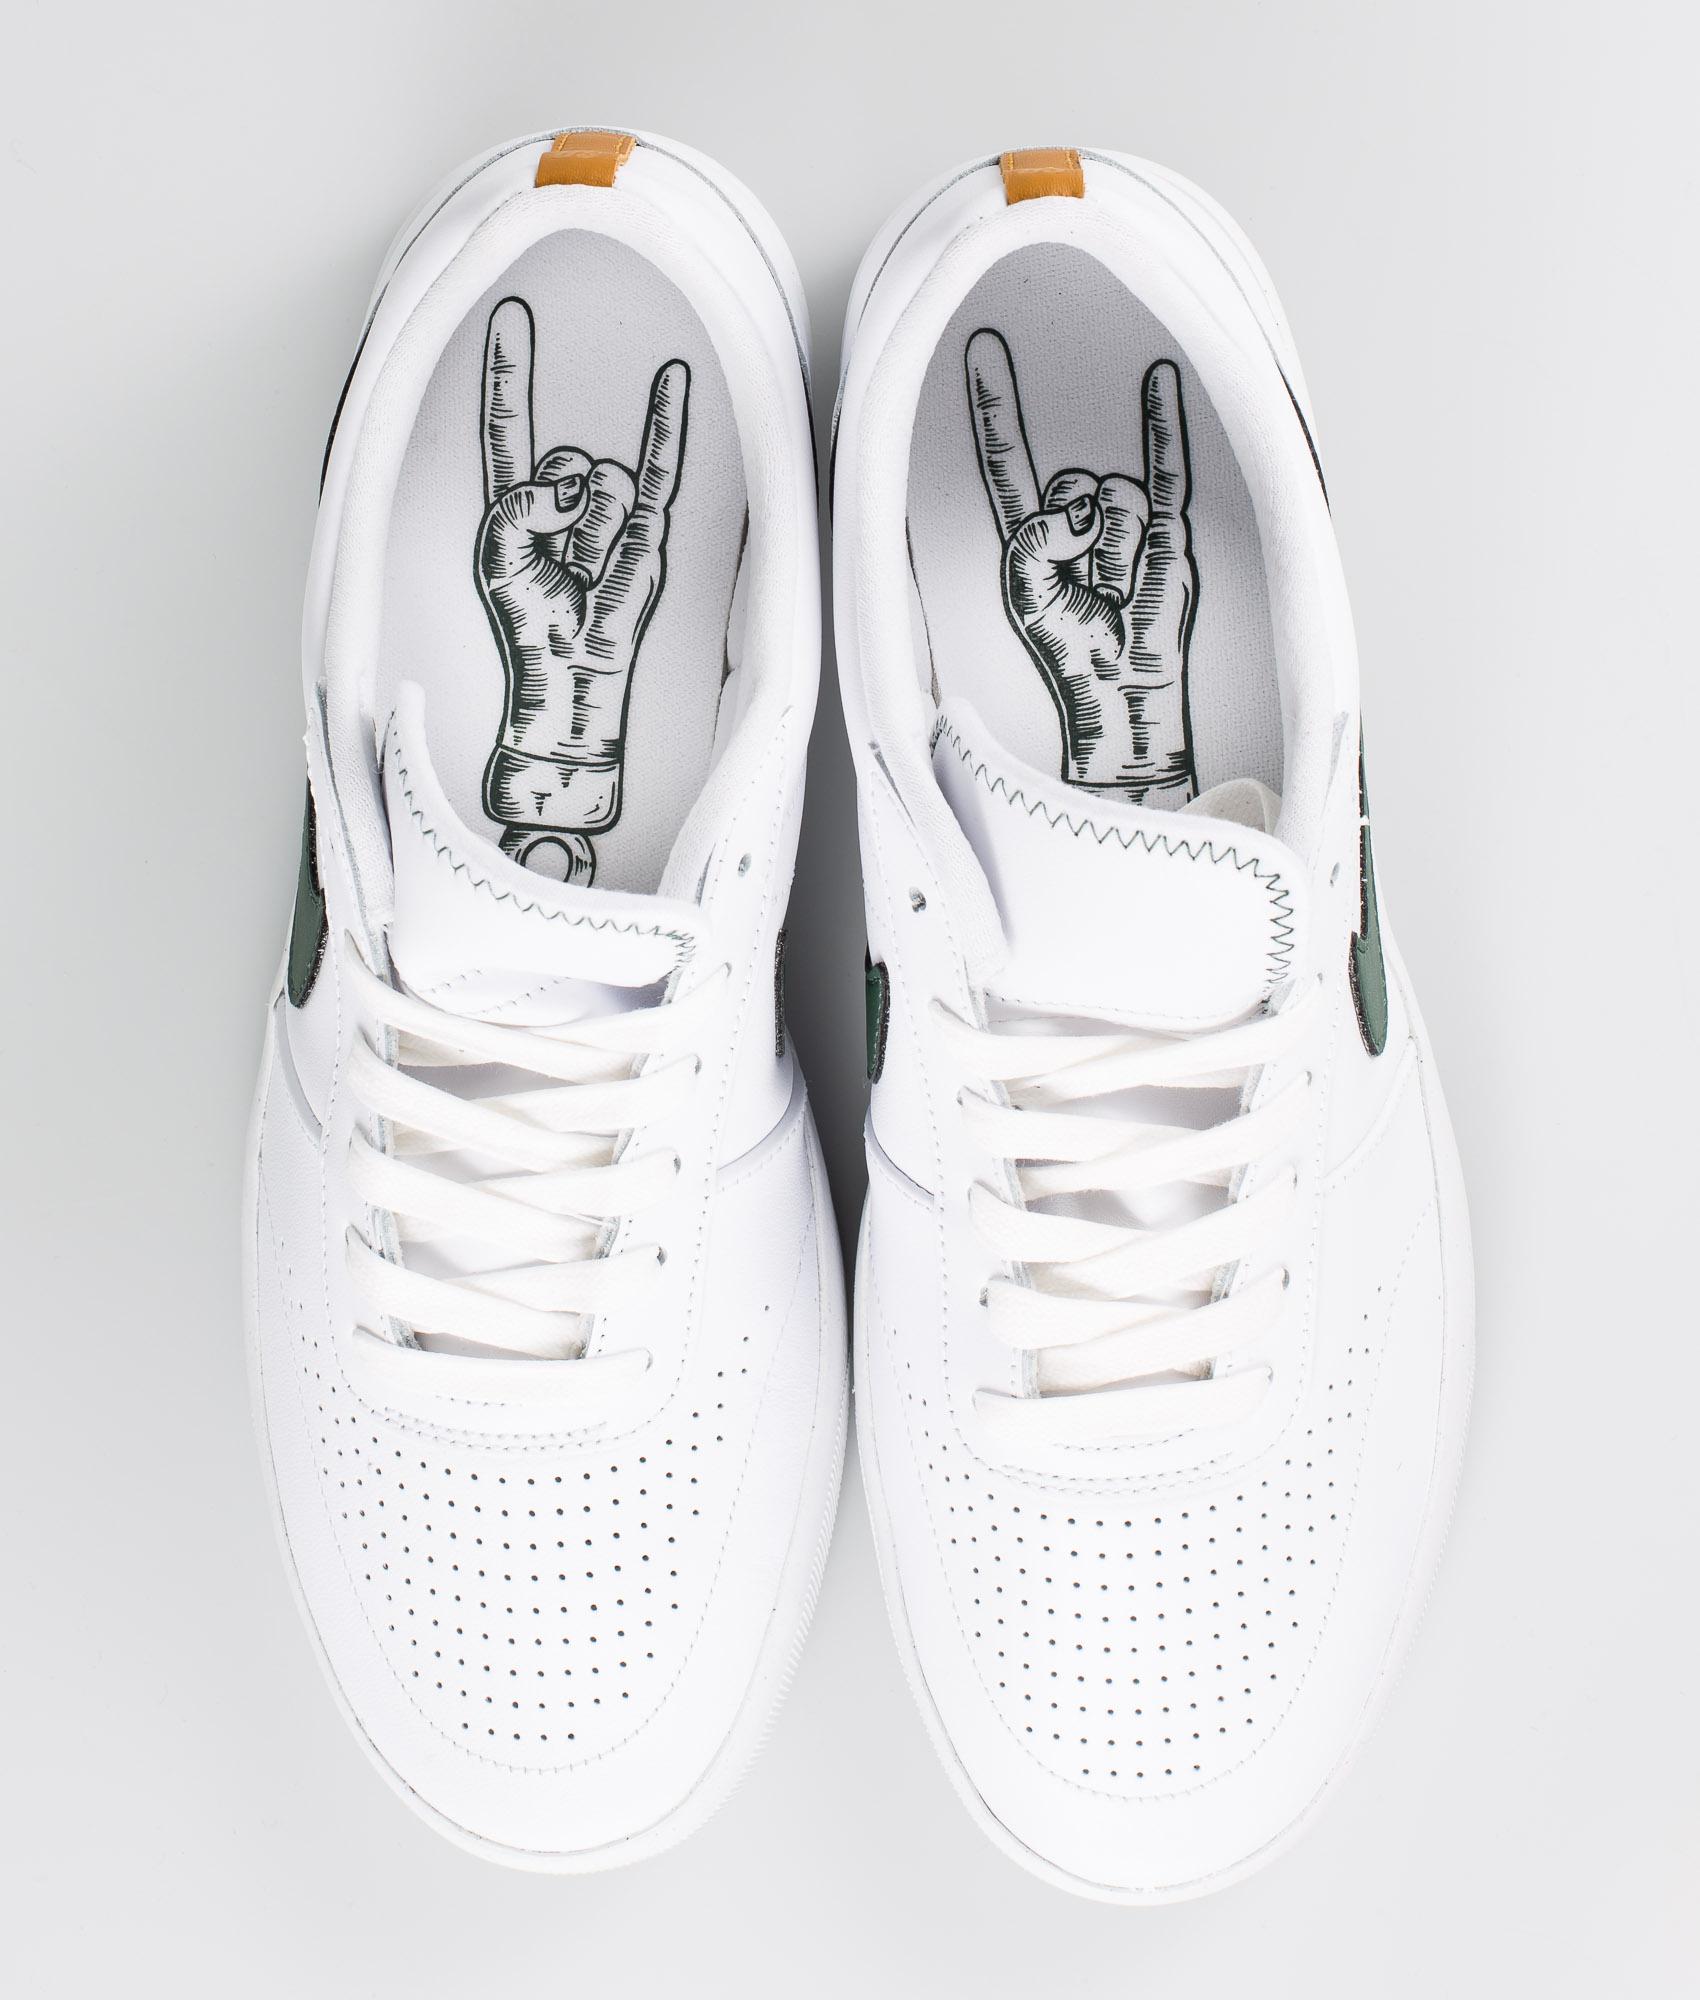 social cascada celos  Nike SB Team Classic Prm Shoes WhiteGalactic Jade Desert Ochre White